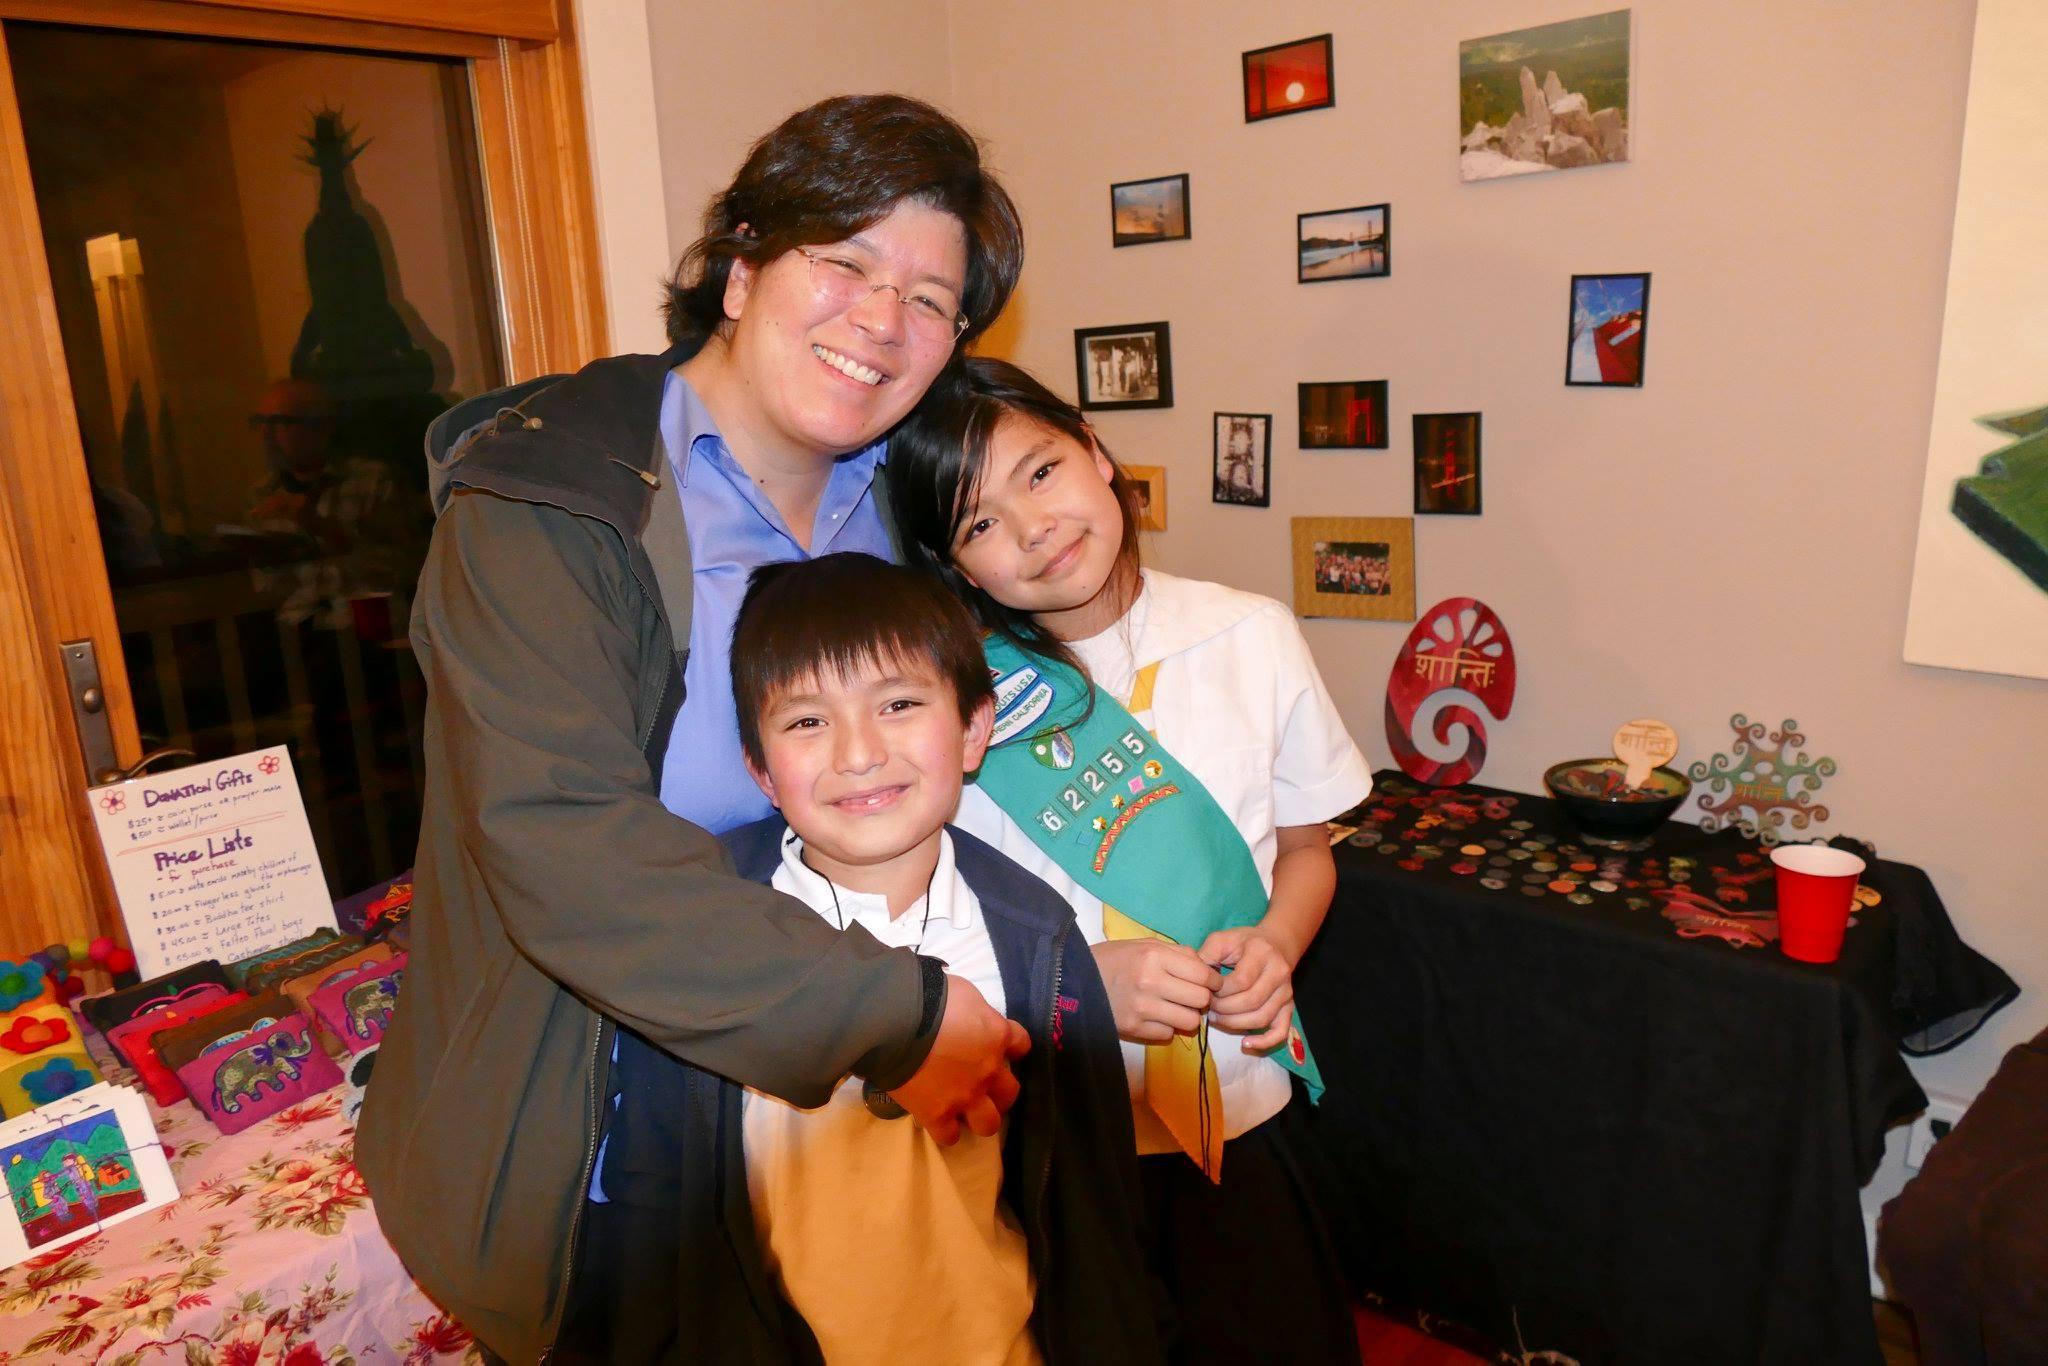 Doc Izumi & kids 2016.jpg